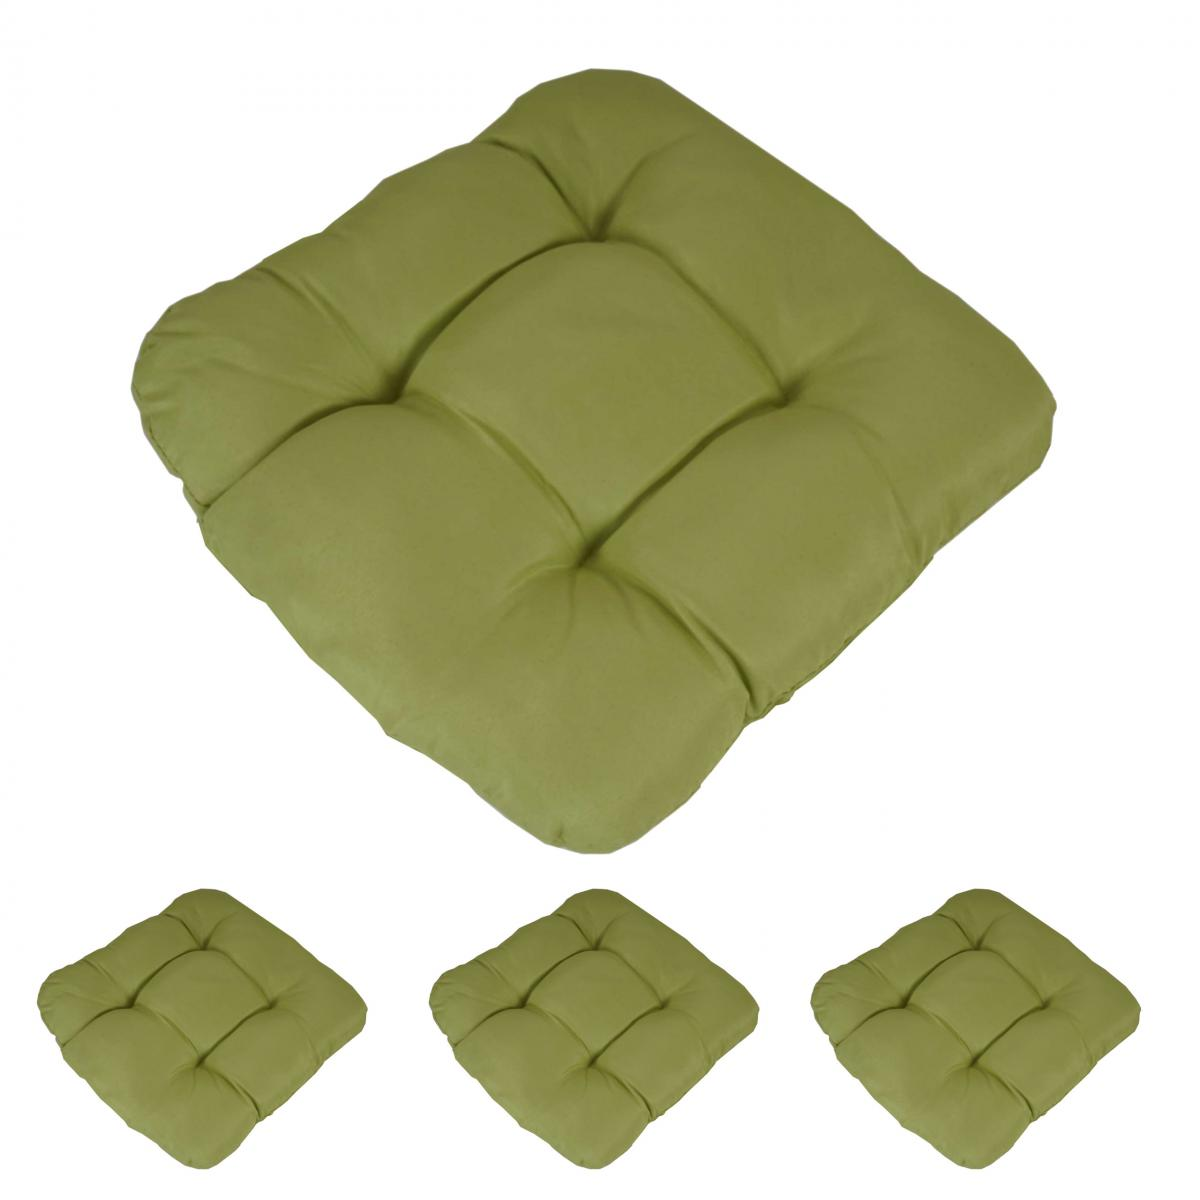 Mendler 4x coussin Dublin, coussins de chaise, 43x41x3cm ~ vert clair